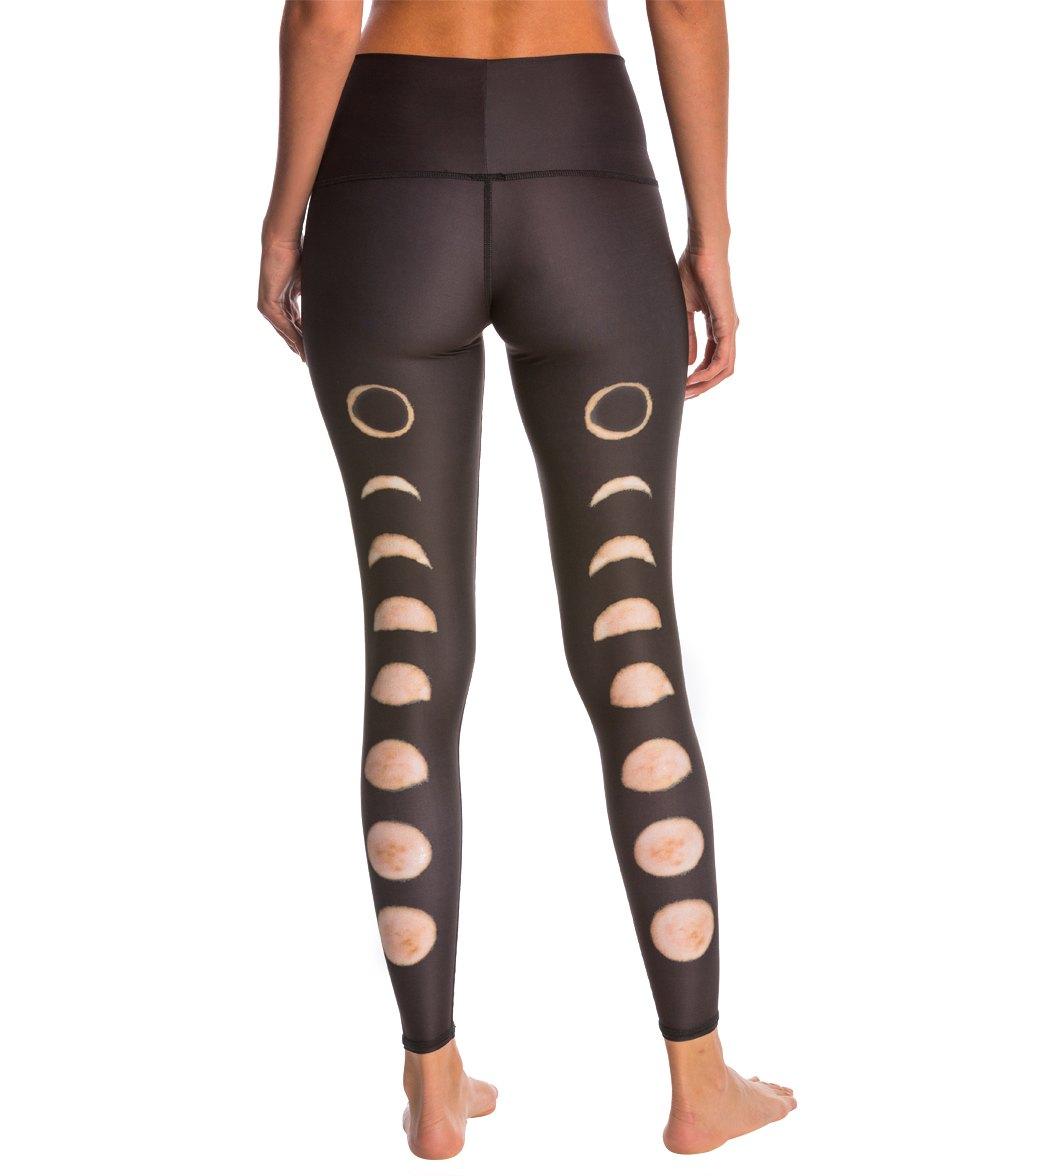 80370b2cb8 Teeki New Moon Black Hot Pants at YogaOutlet.com - Free Shipping